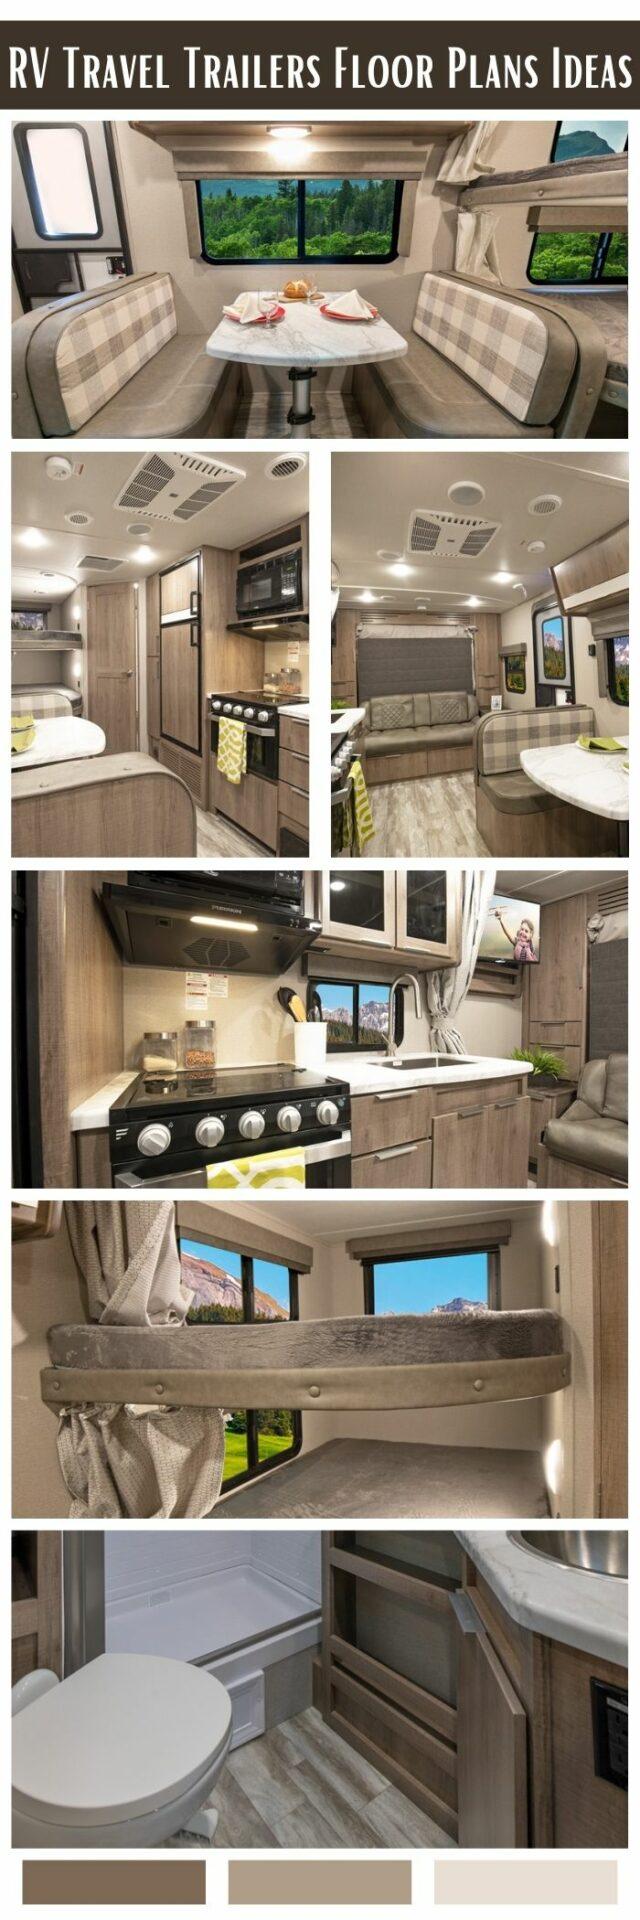 bunkhouse rv floor plans